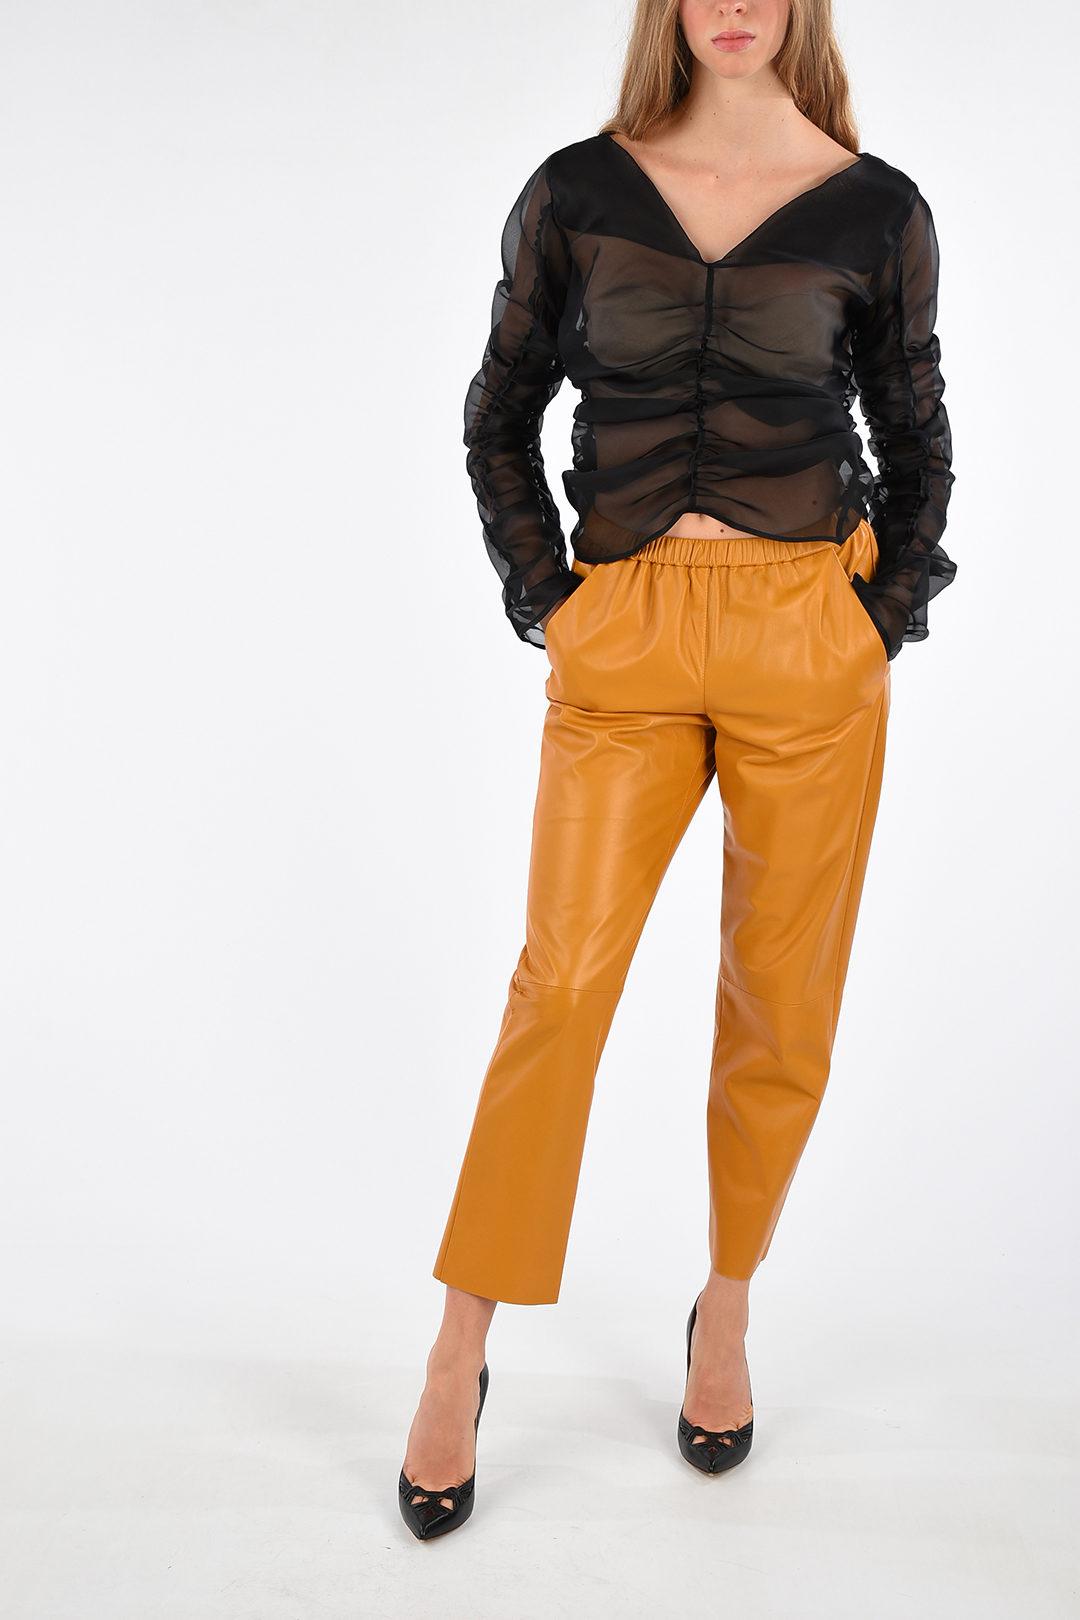 DROMe Capri Leather Pants women - Glamood Outlet